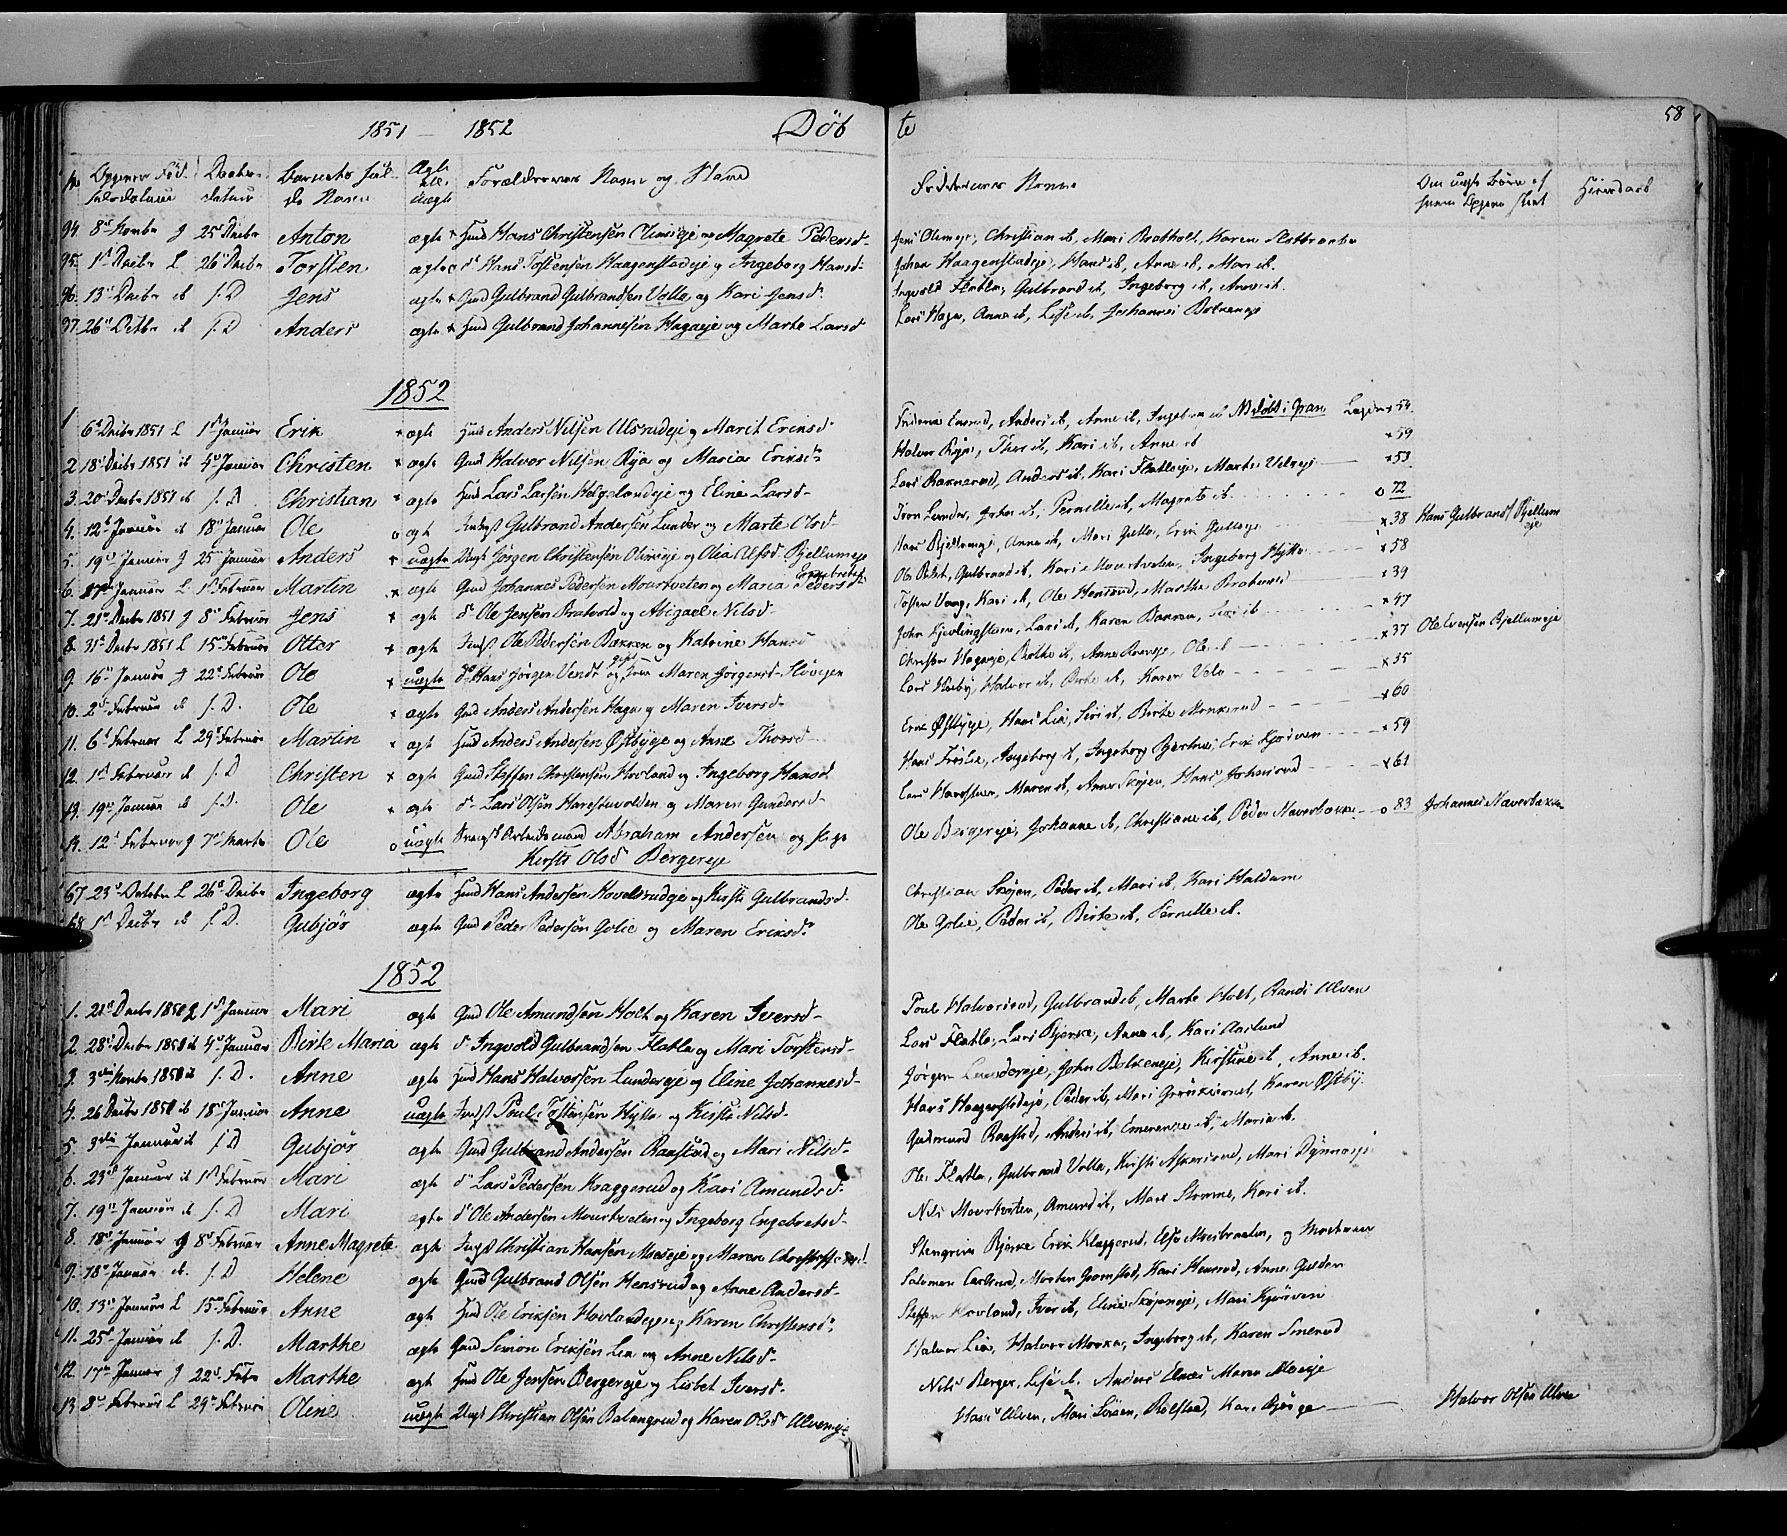 SAH, Jevnaker prestekontor, Ministerialbok nr. 6, 1837-1857, s. 58